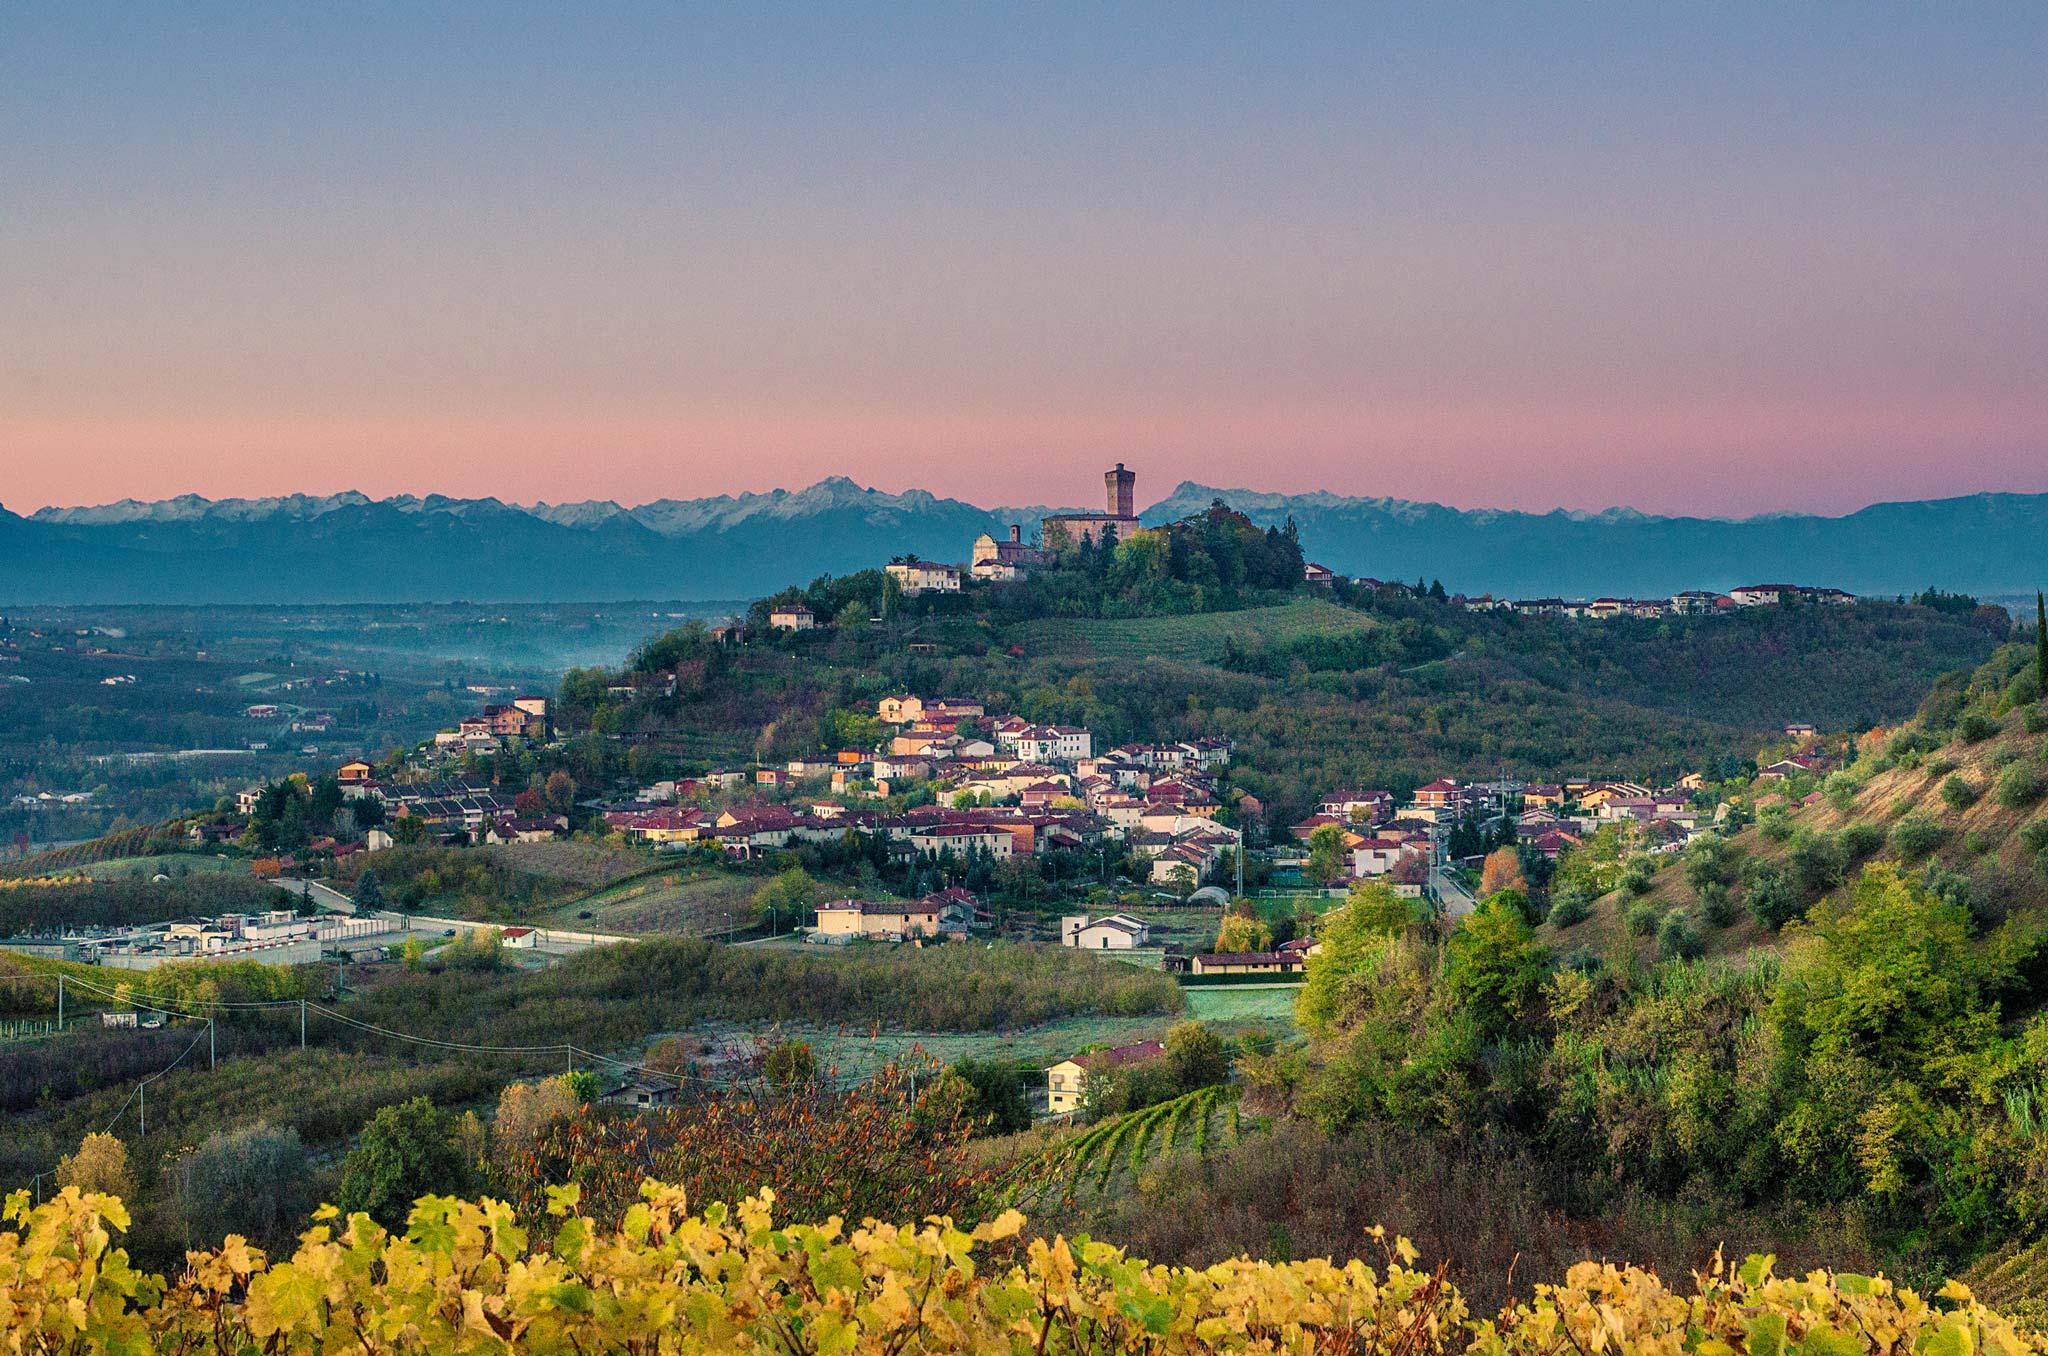 Paesaggi-Italia - Santa Vittoria dAlba - Santa-Vittoria-d'Alba -